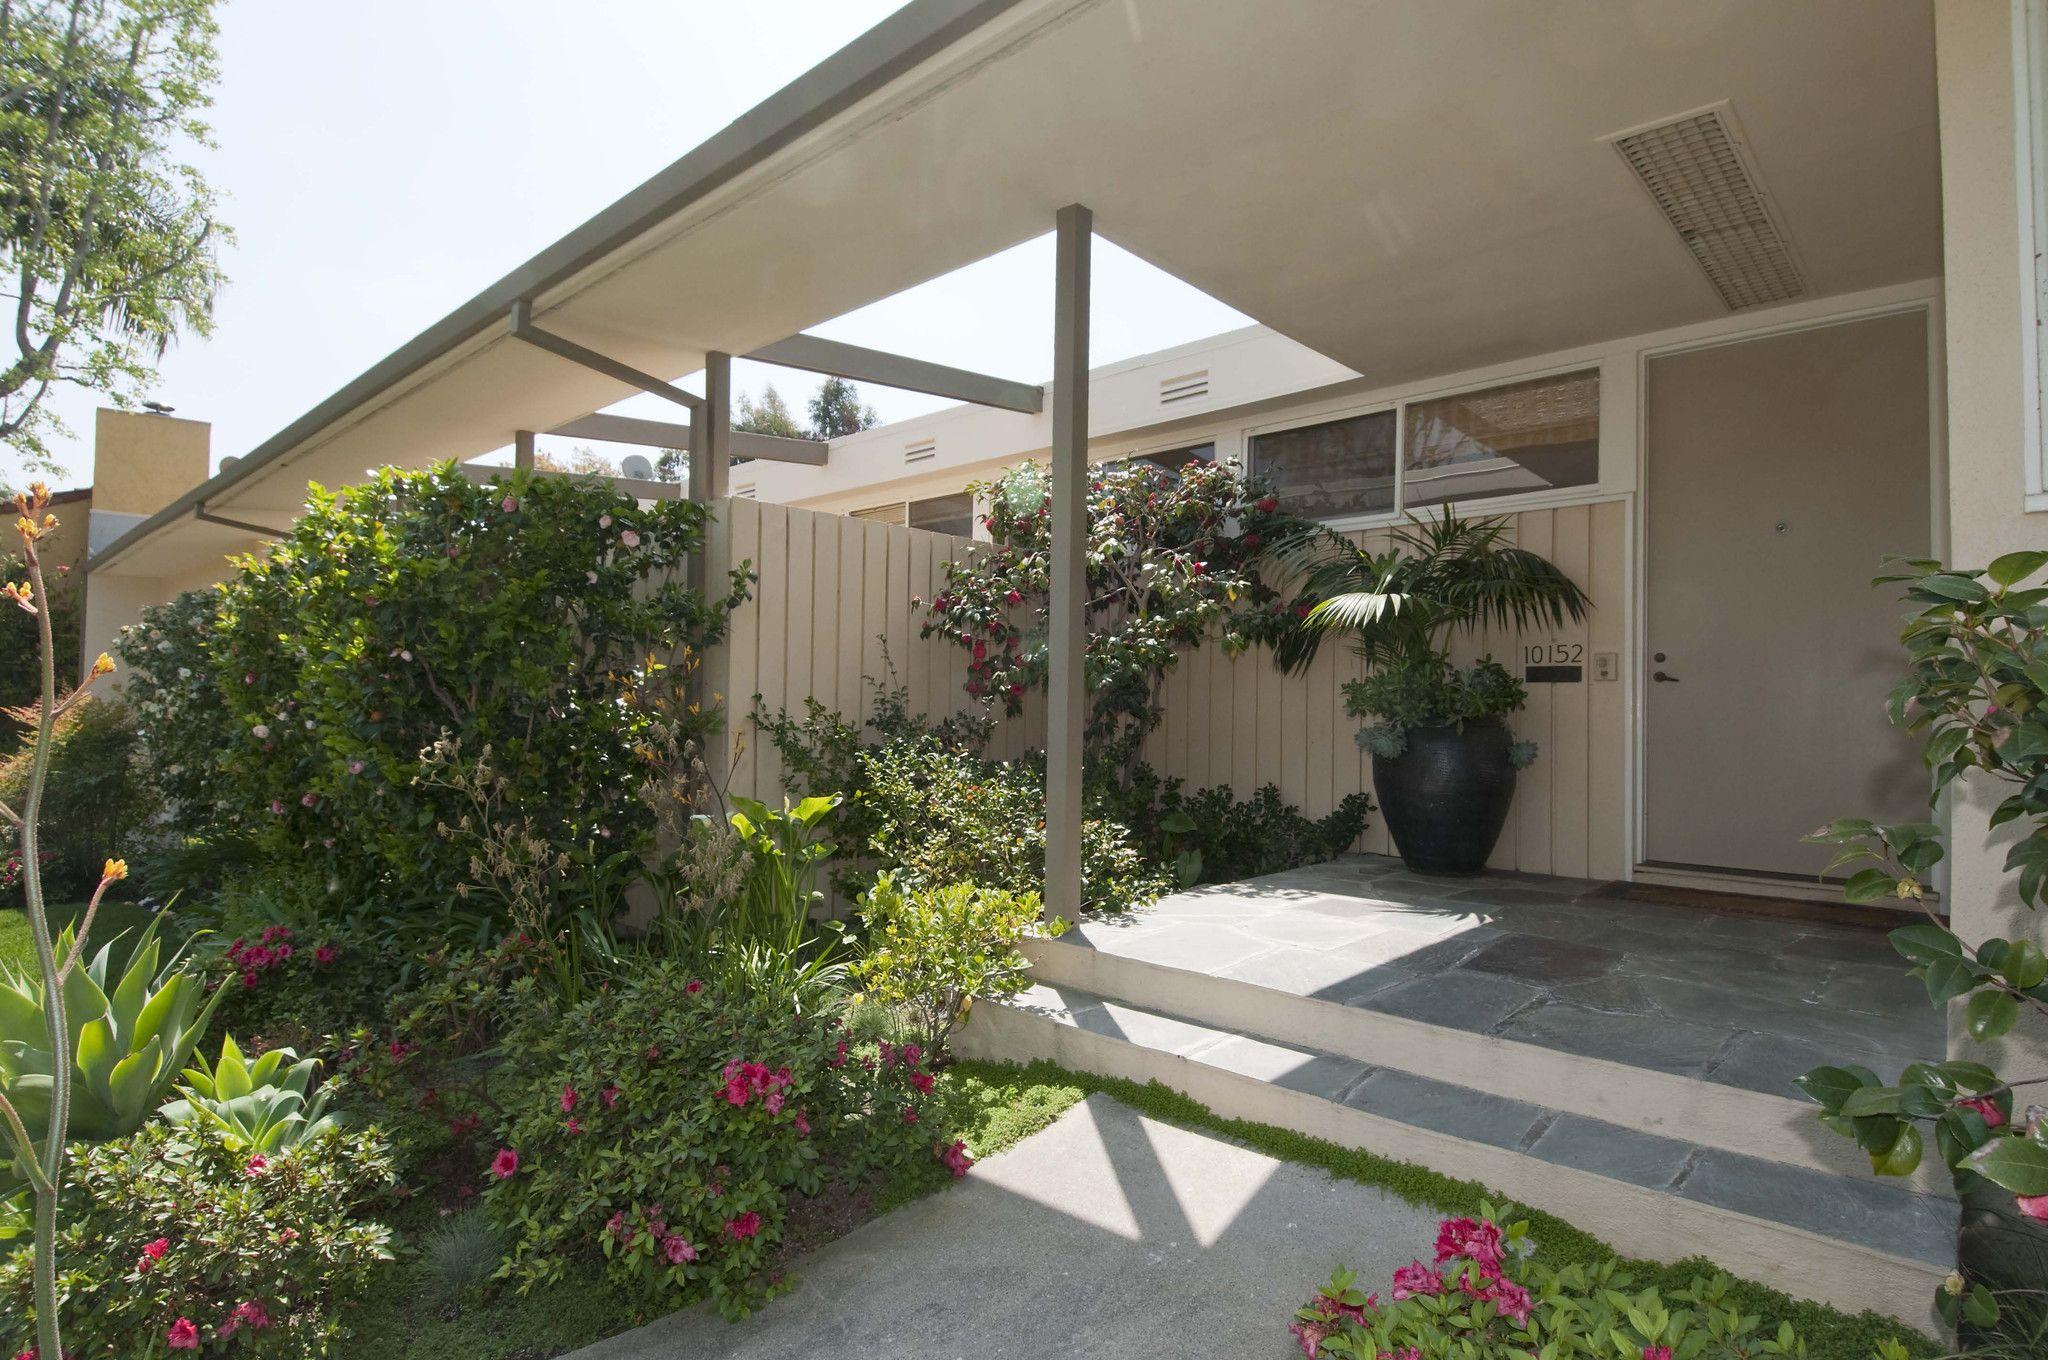 The Stahl House in LA  Case Study House      Pierre Koenig Los Angeles Pinterest